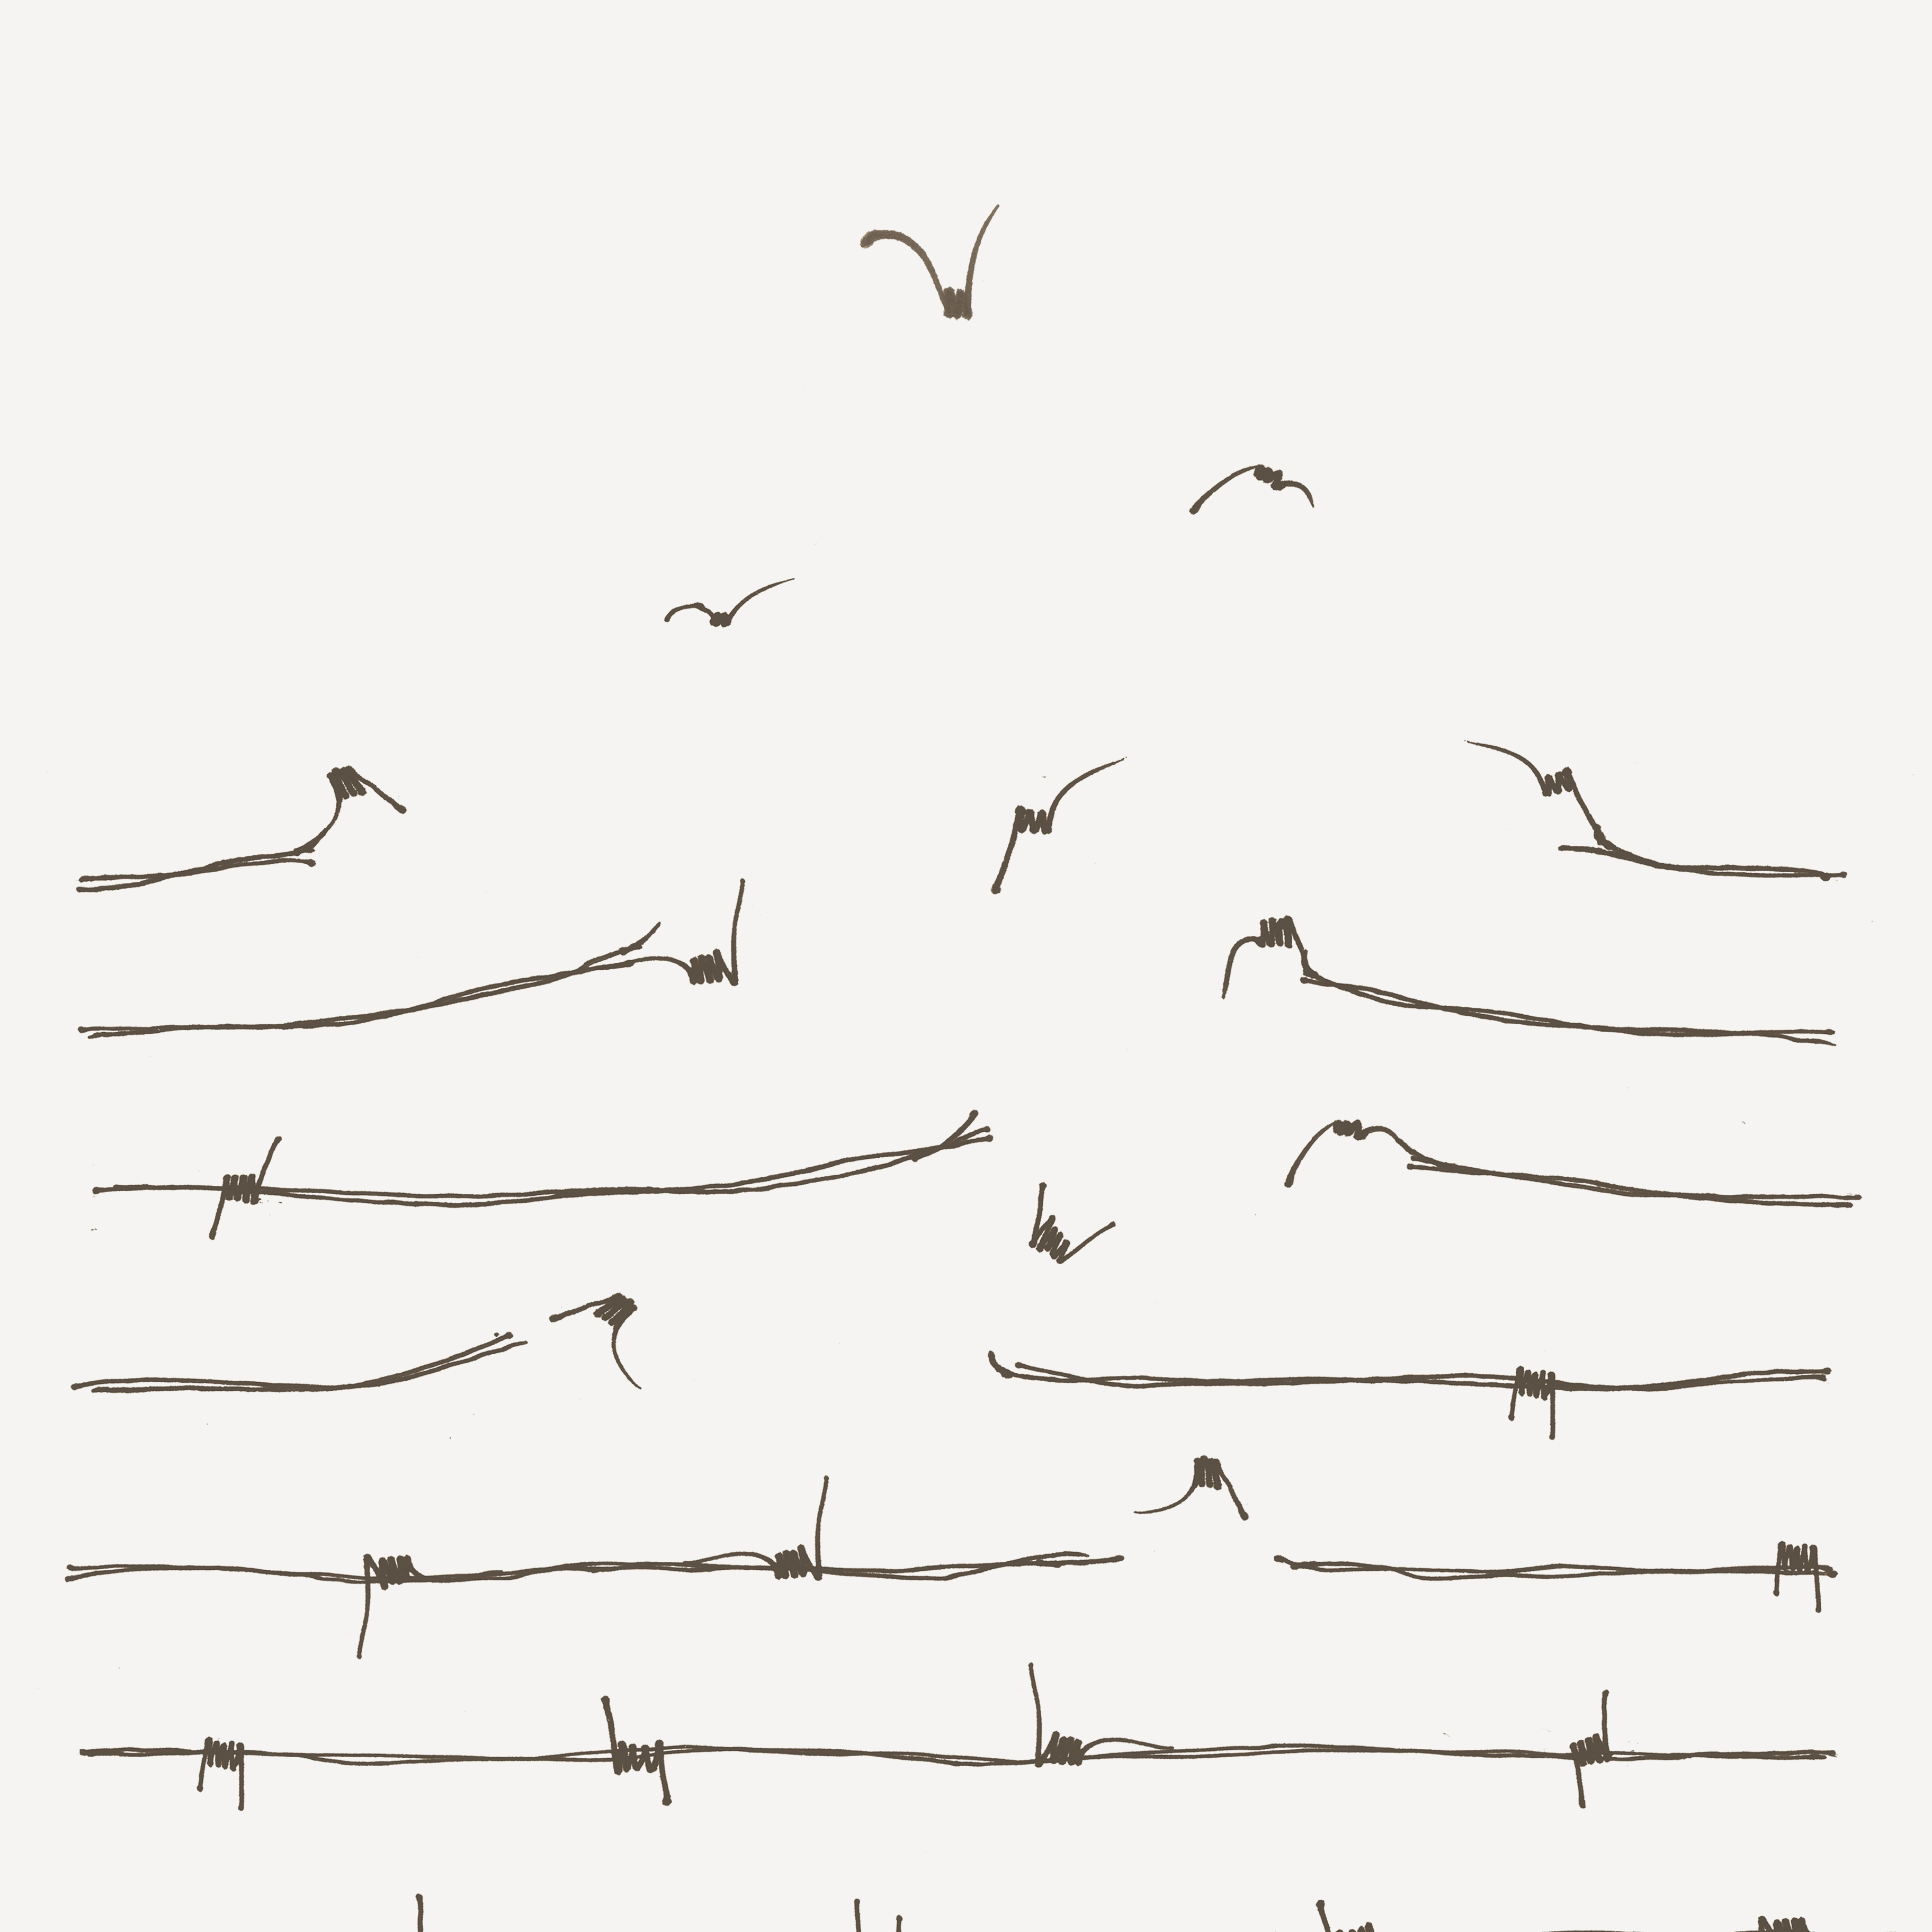 shutterstock_fence birds.jpg